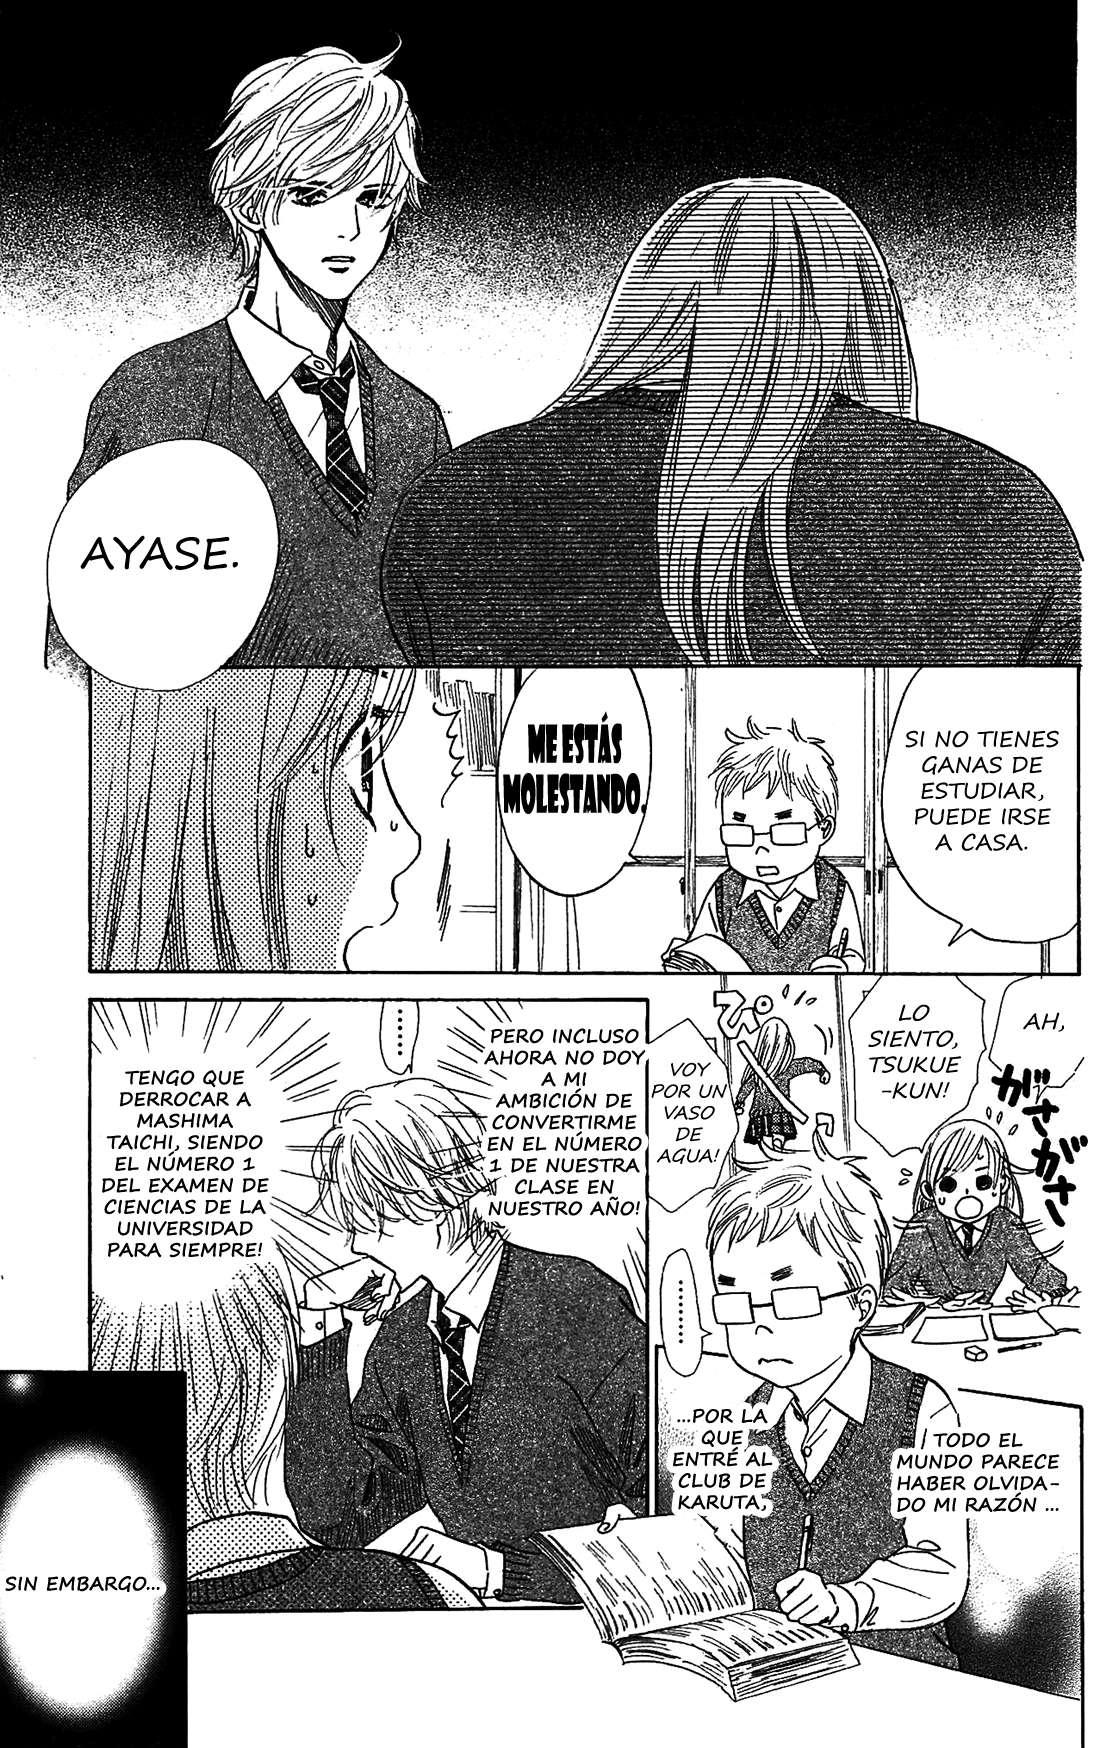 http://c5.ninemanga.com/es_manga/32/1824/398211/f21bd25ba42aa833acfd6c8c288f60dc.jpg Page 18